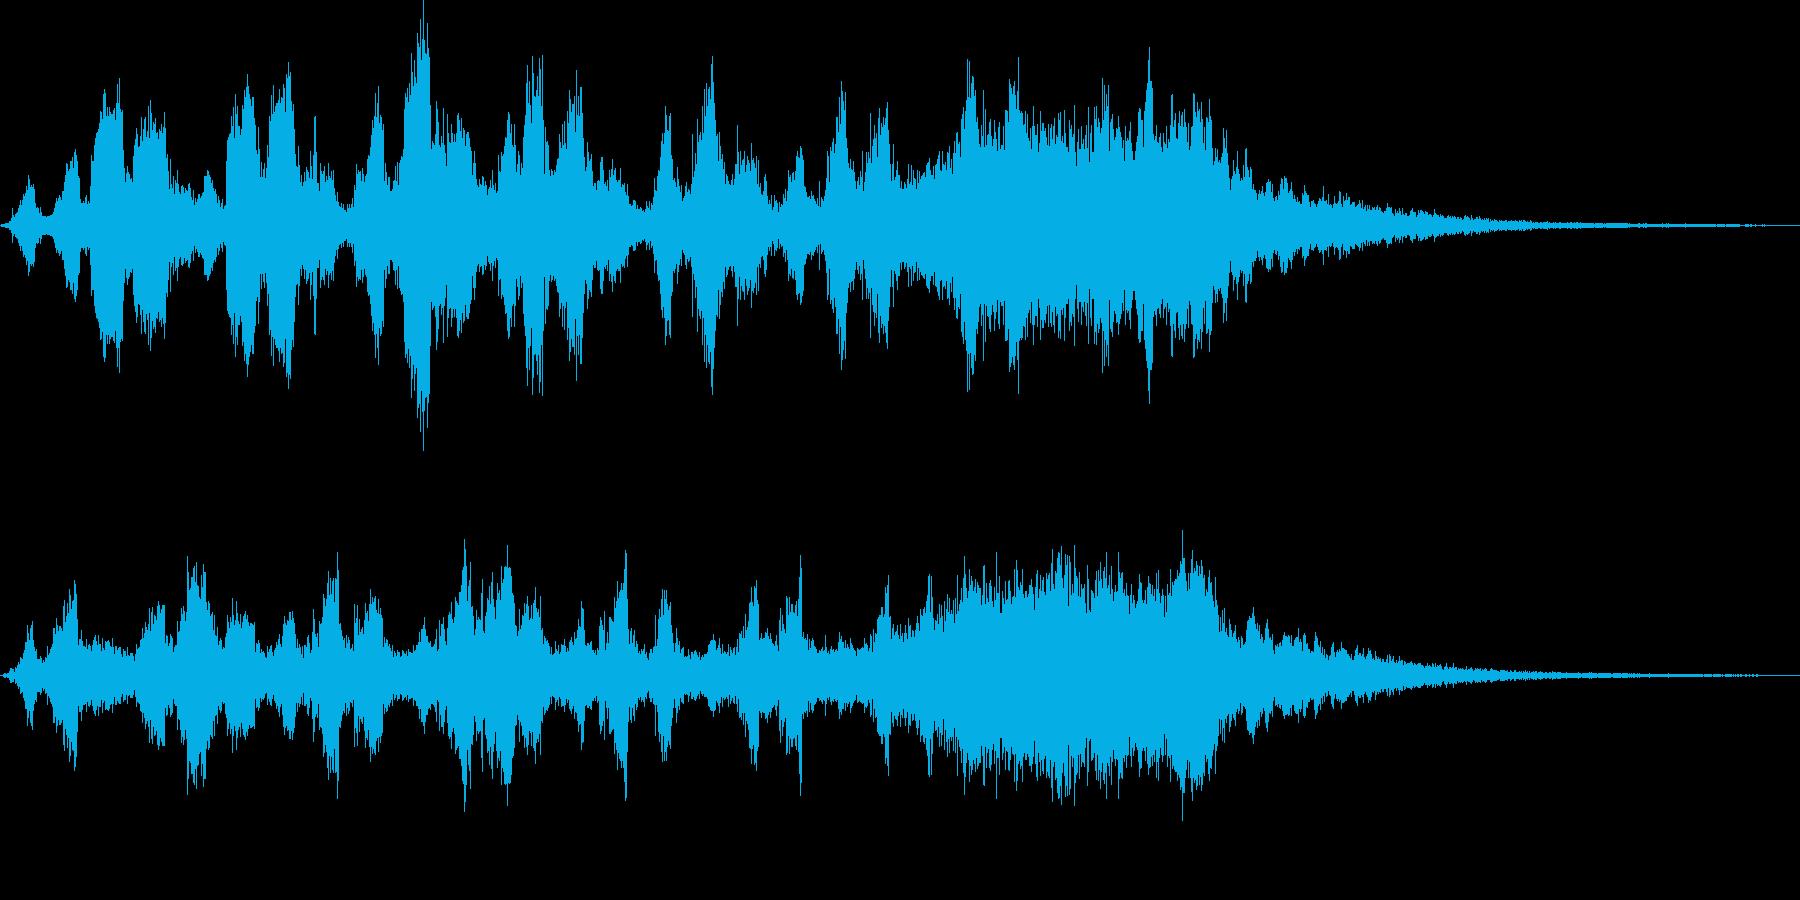 CINEMATIC RISER_09の再生済みの波形